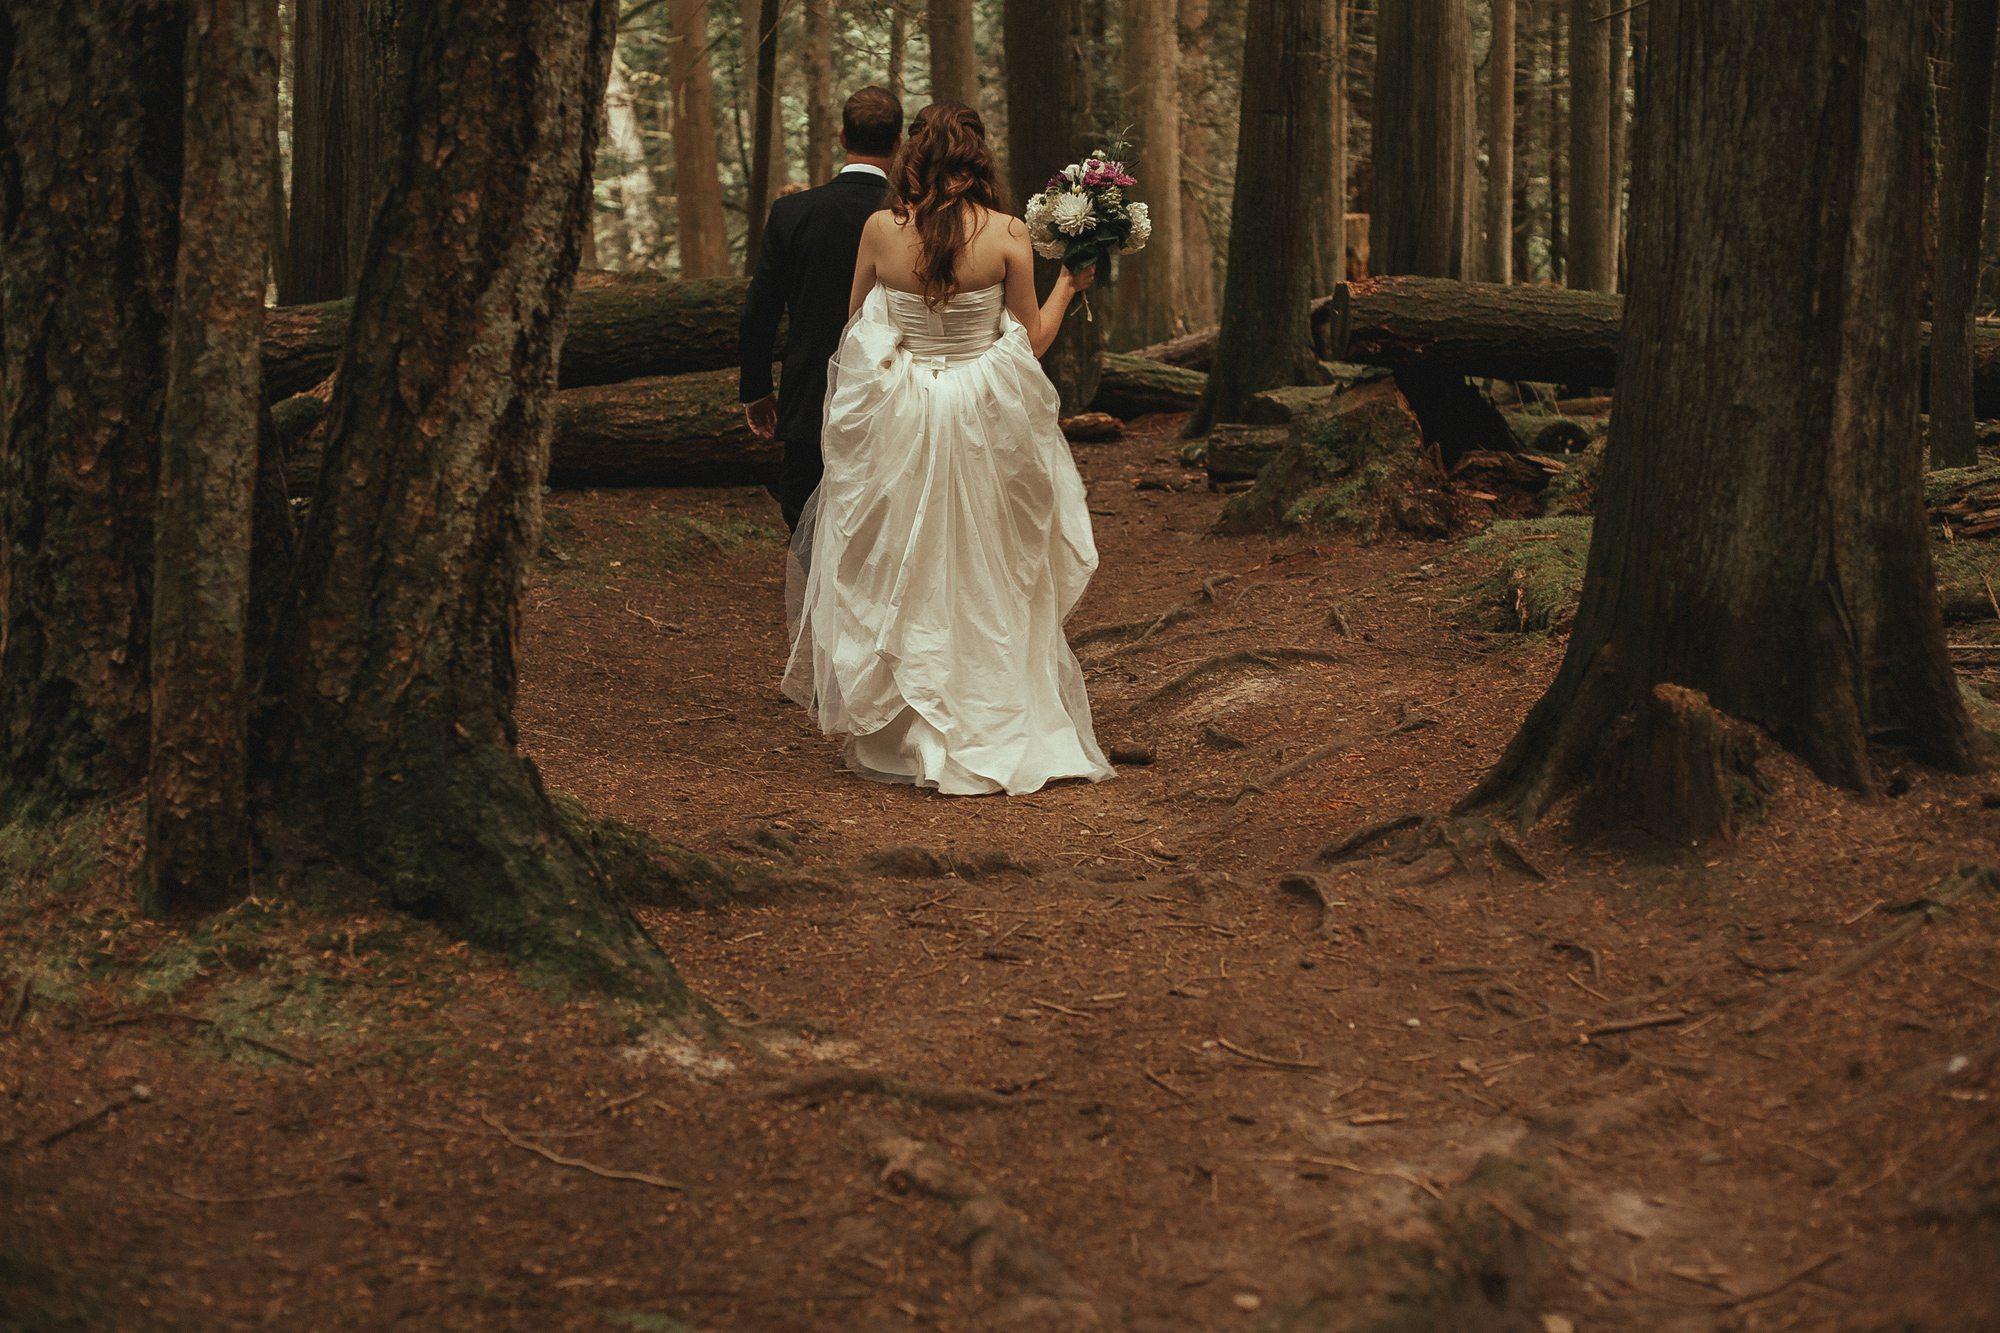 gibsons-wedding-photography-robert-devon45